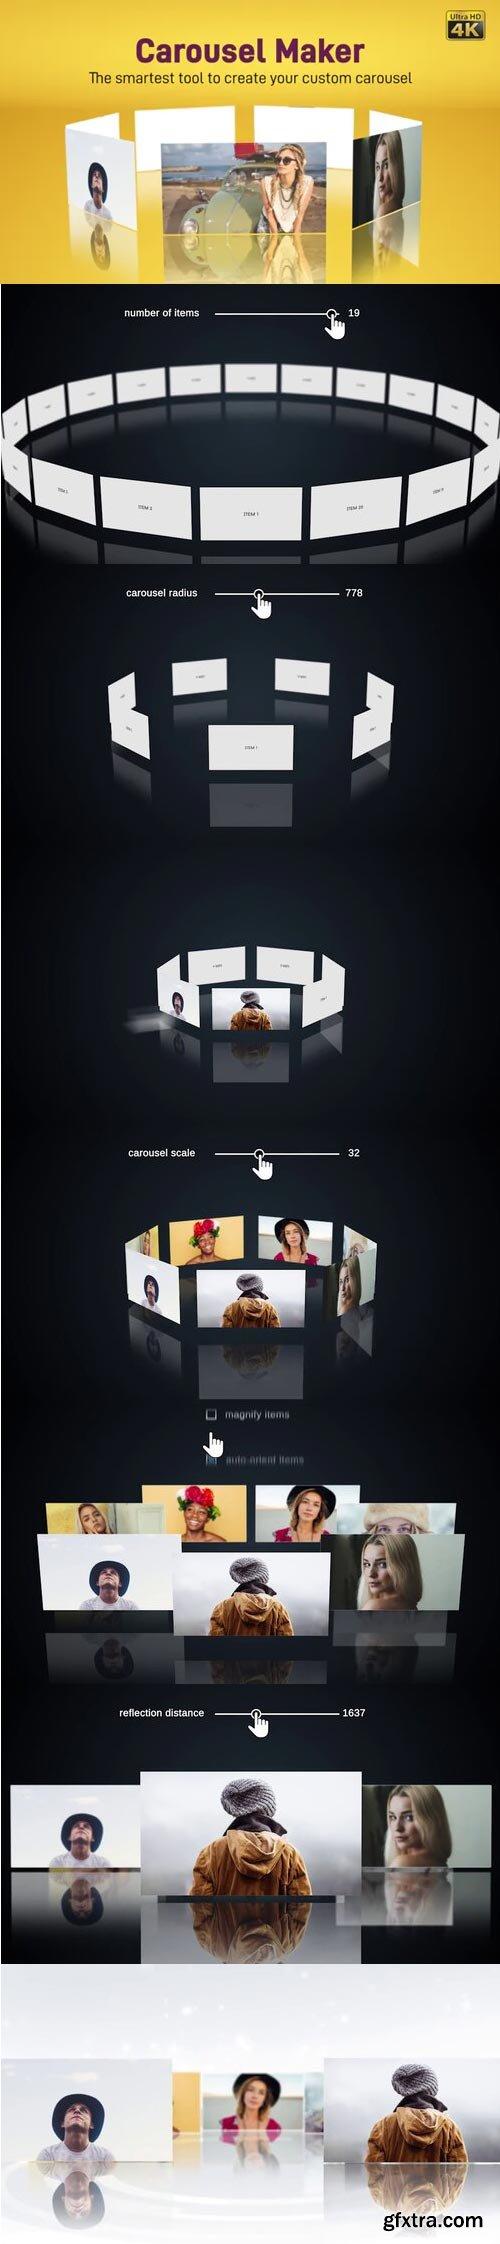 Videohive - Carousel Maker - 32273770